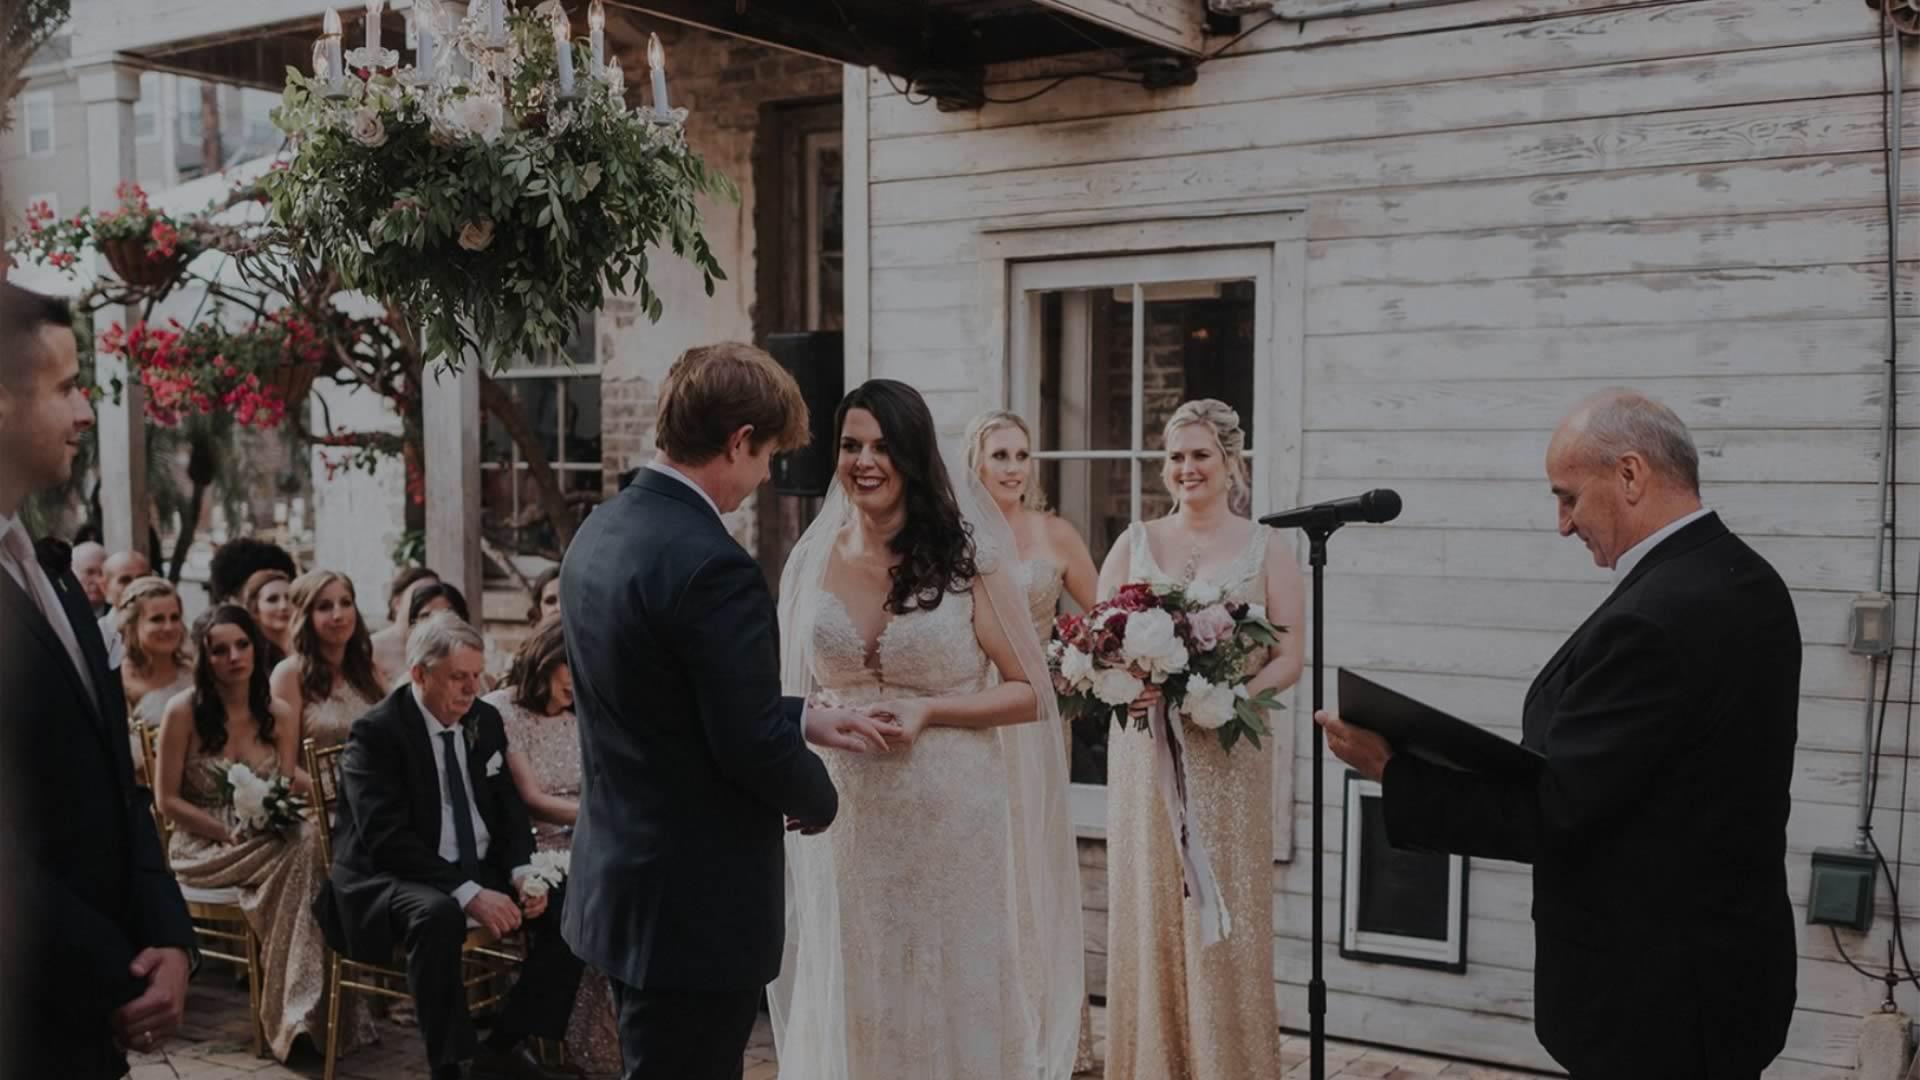 locations - Sensational Ceremonies